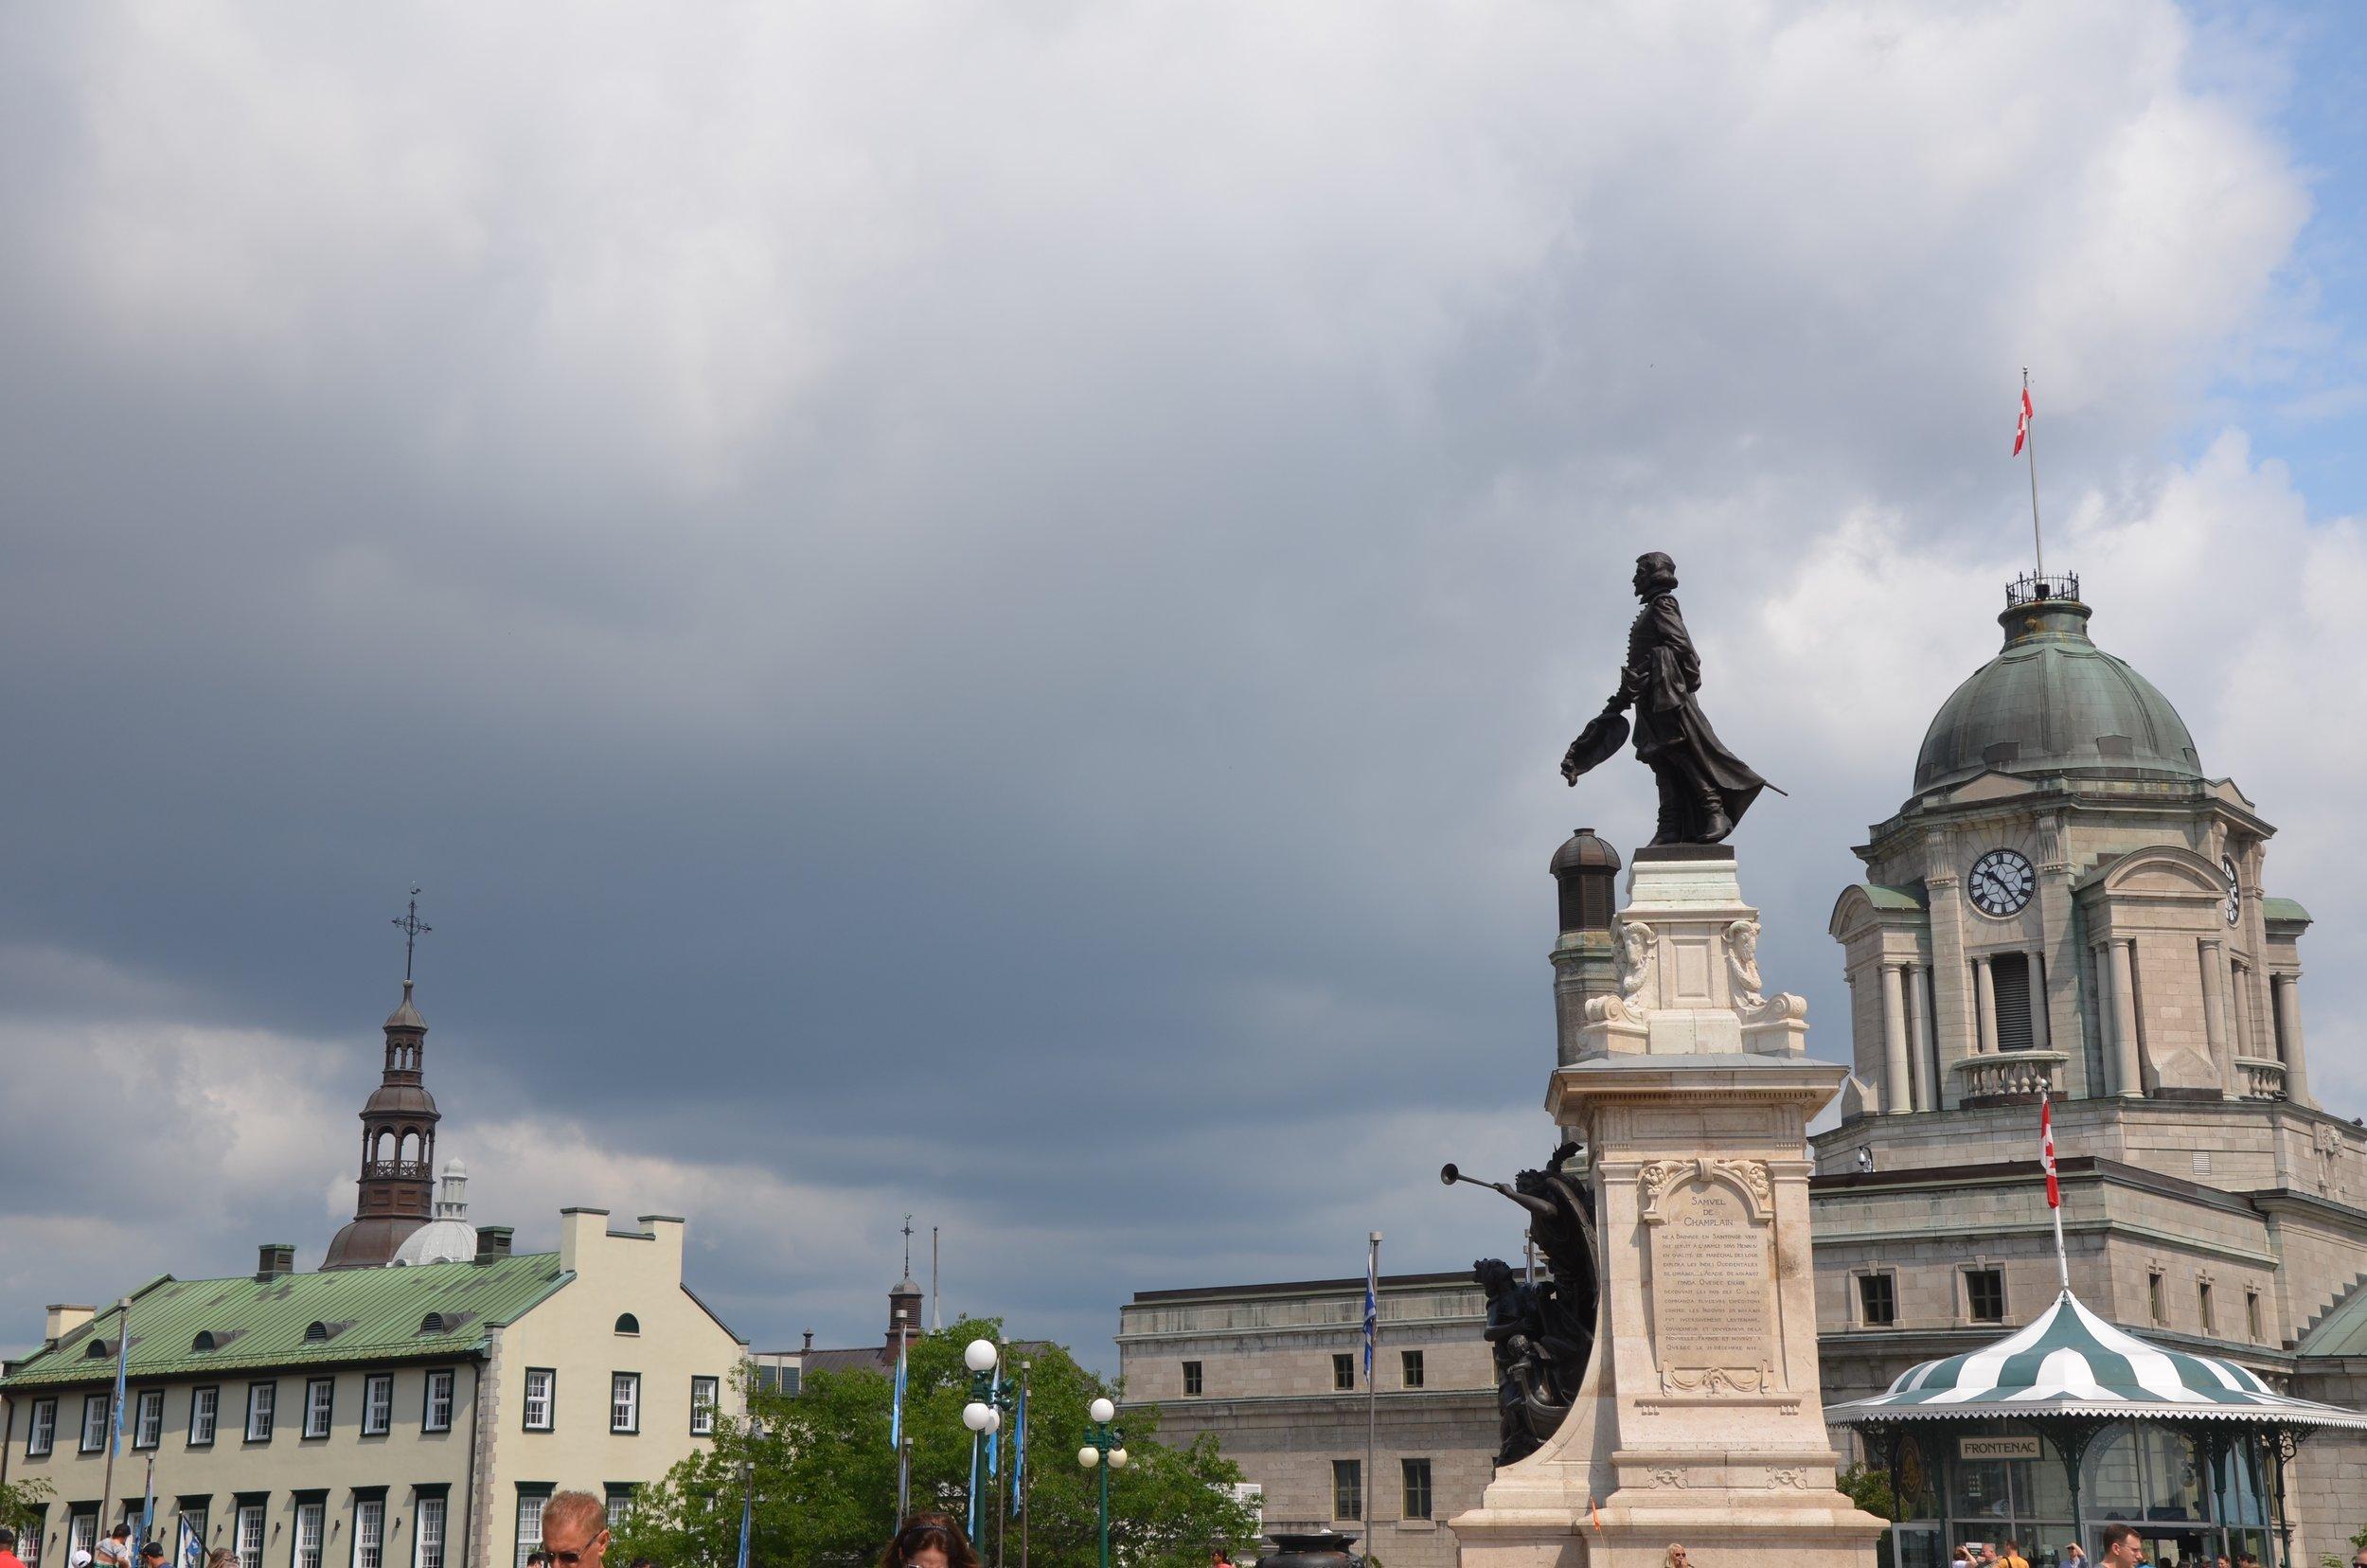 The statue of Samuel de Champlain stands guard on the  Terrasse Dufferin.